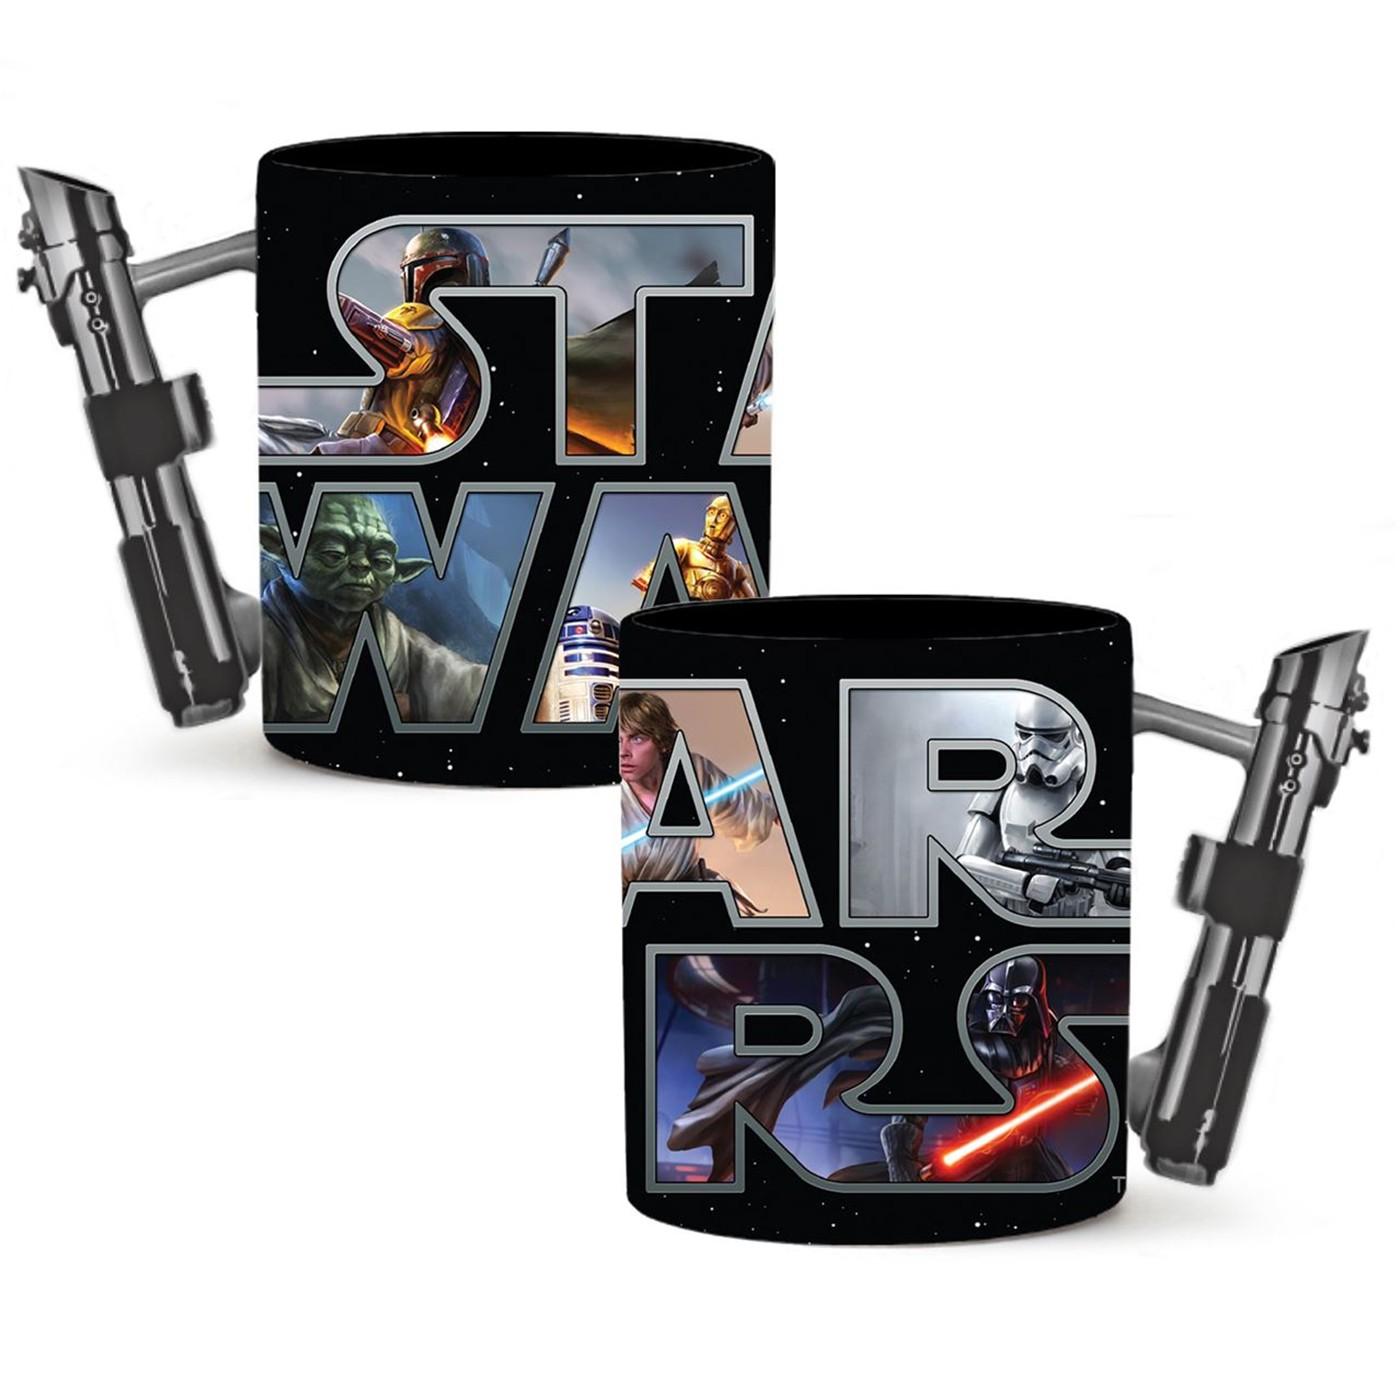 Star Wars 3D Lightsaber Mug